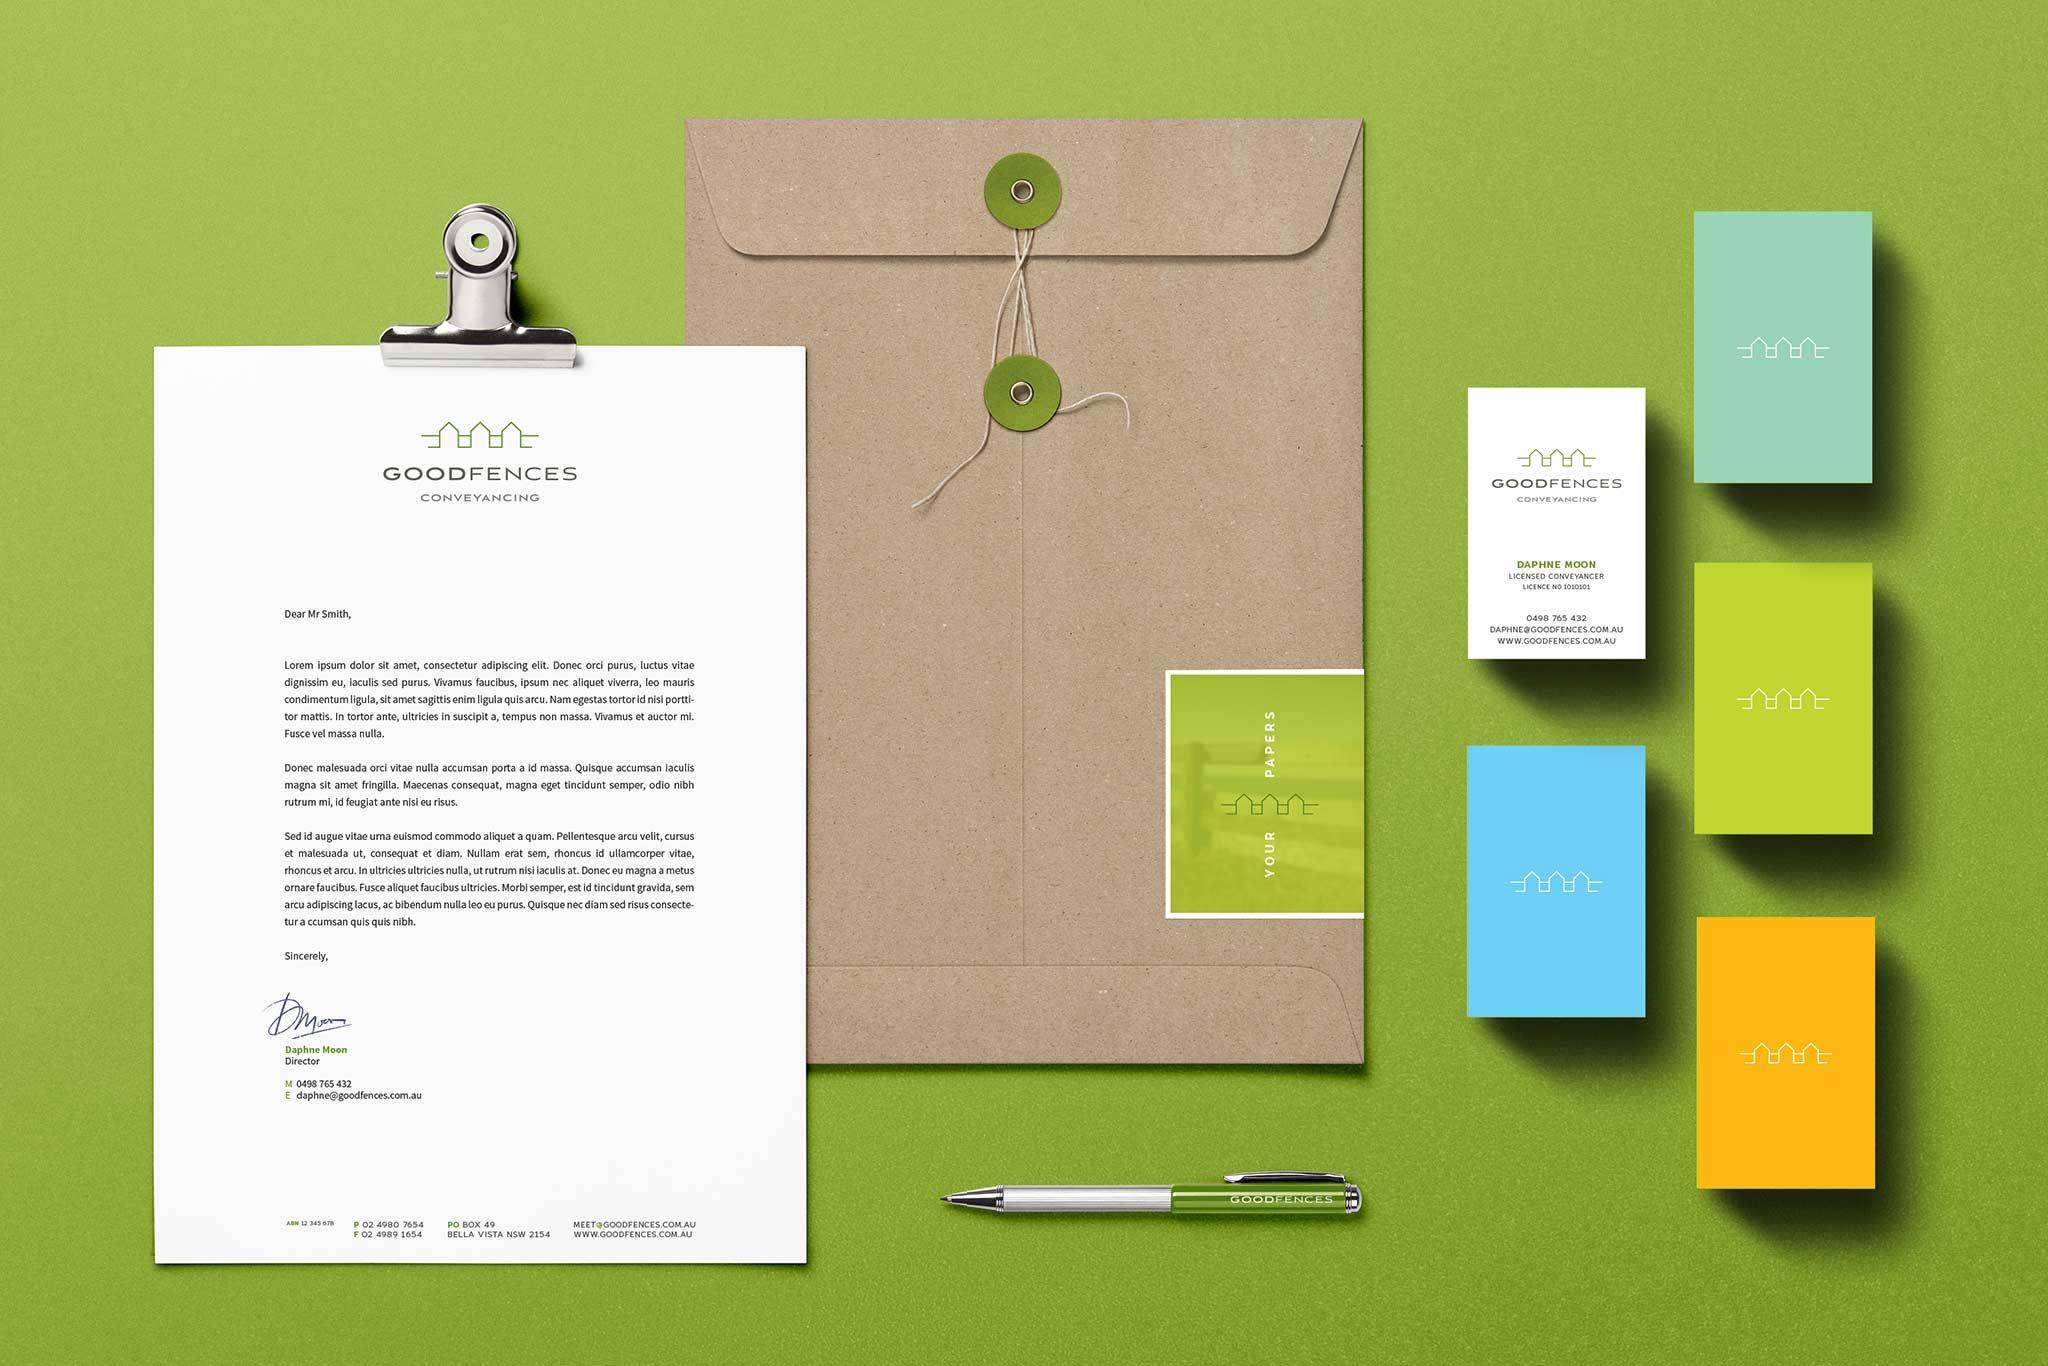 goodfences-conveyancing-branding_3